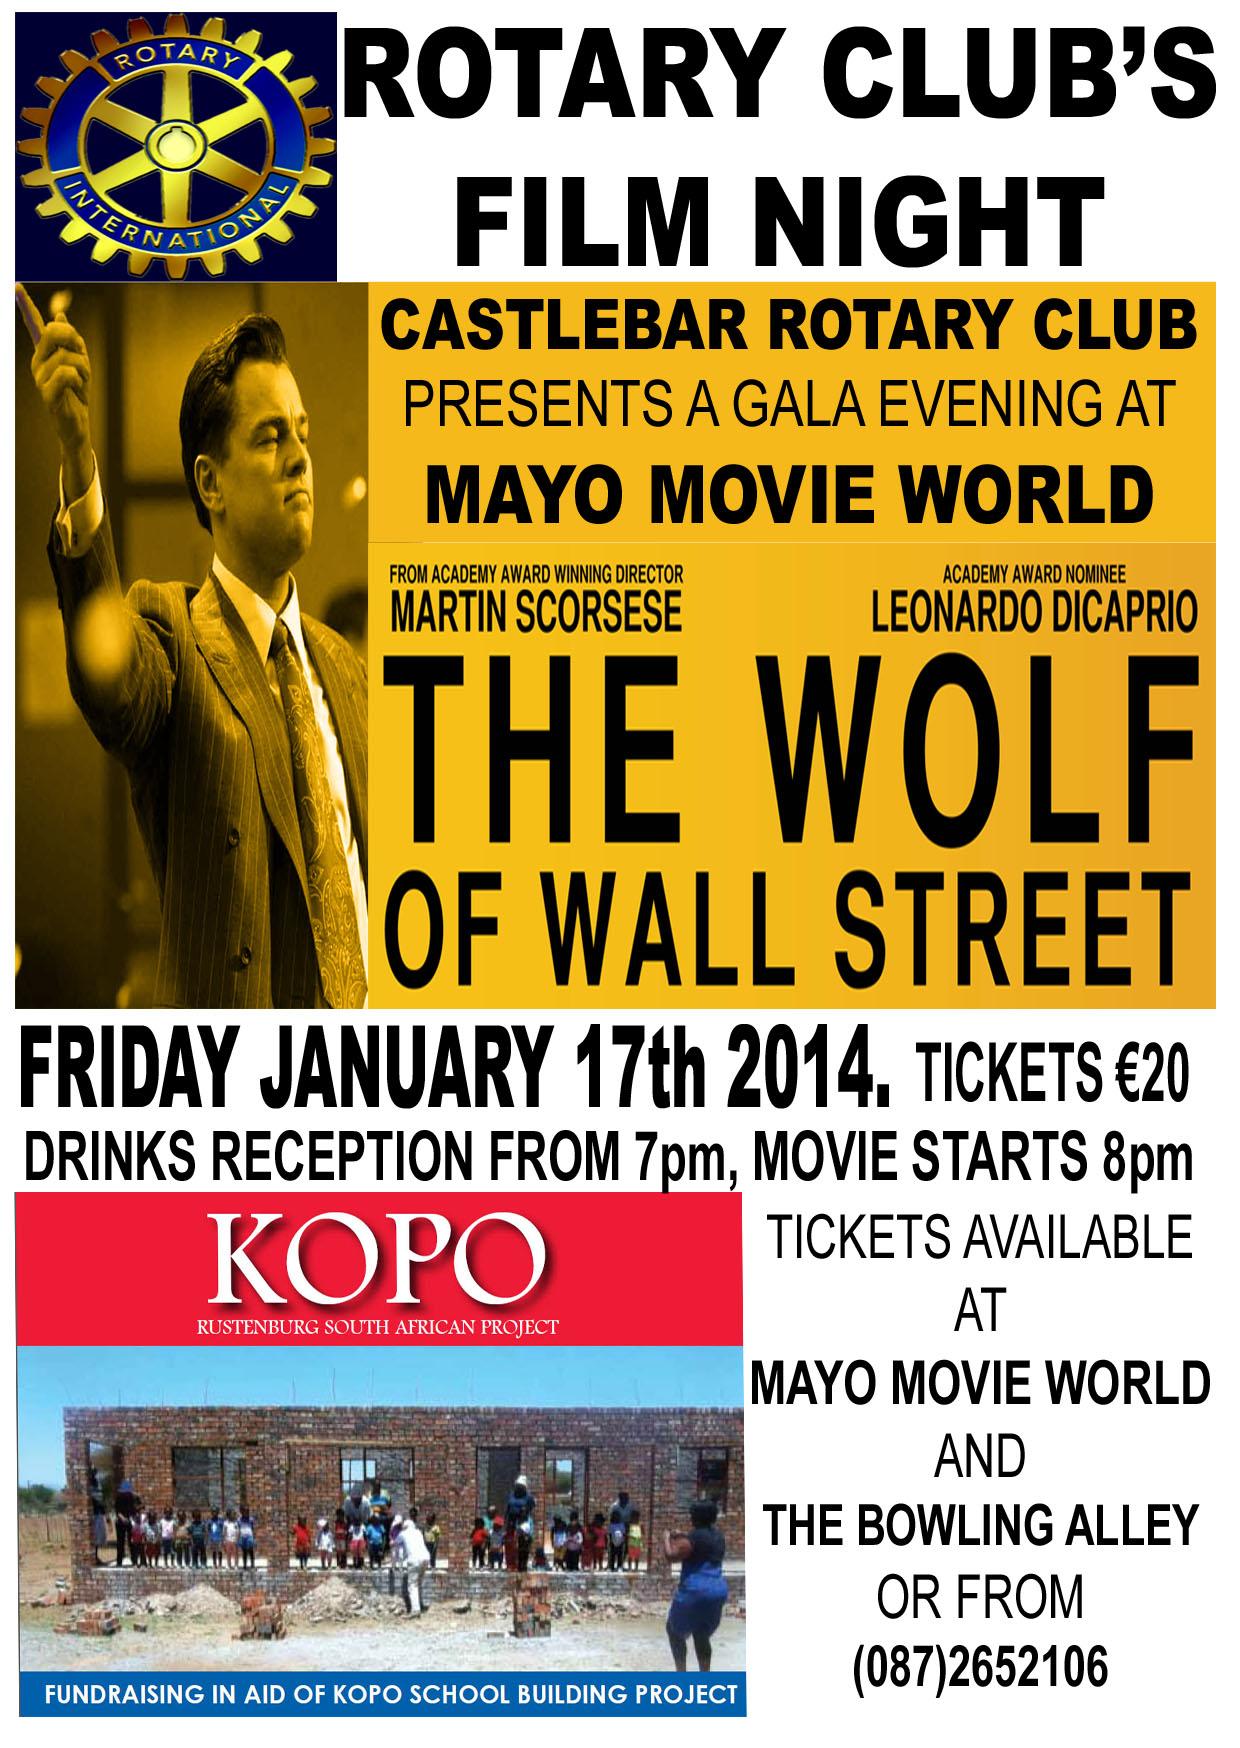 Rotary Club Film Night